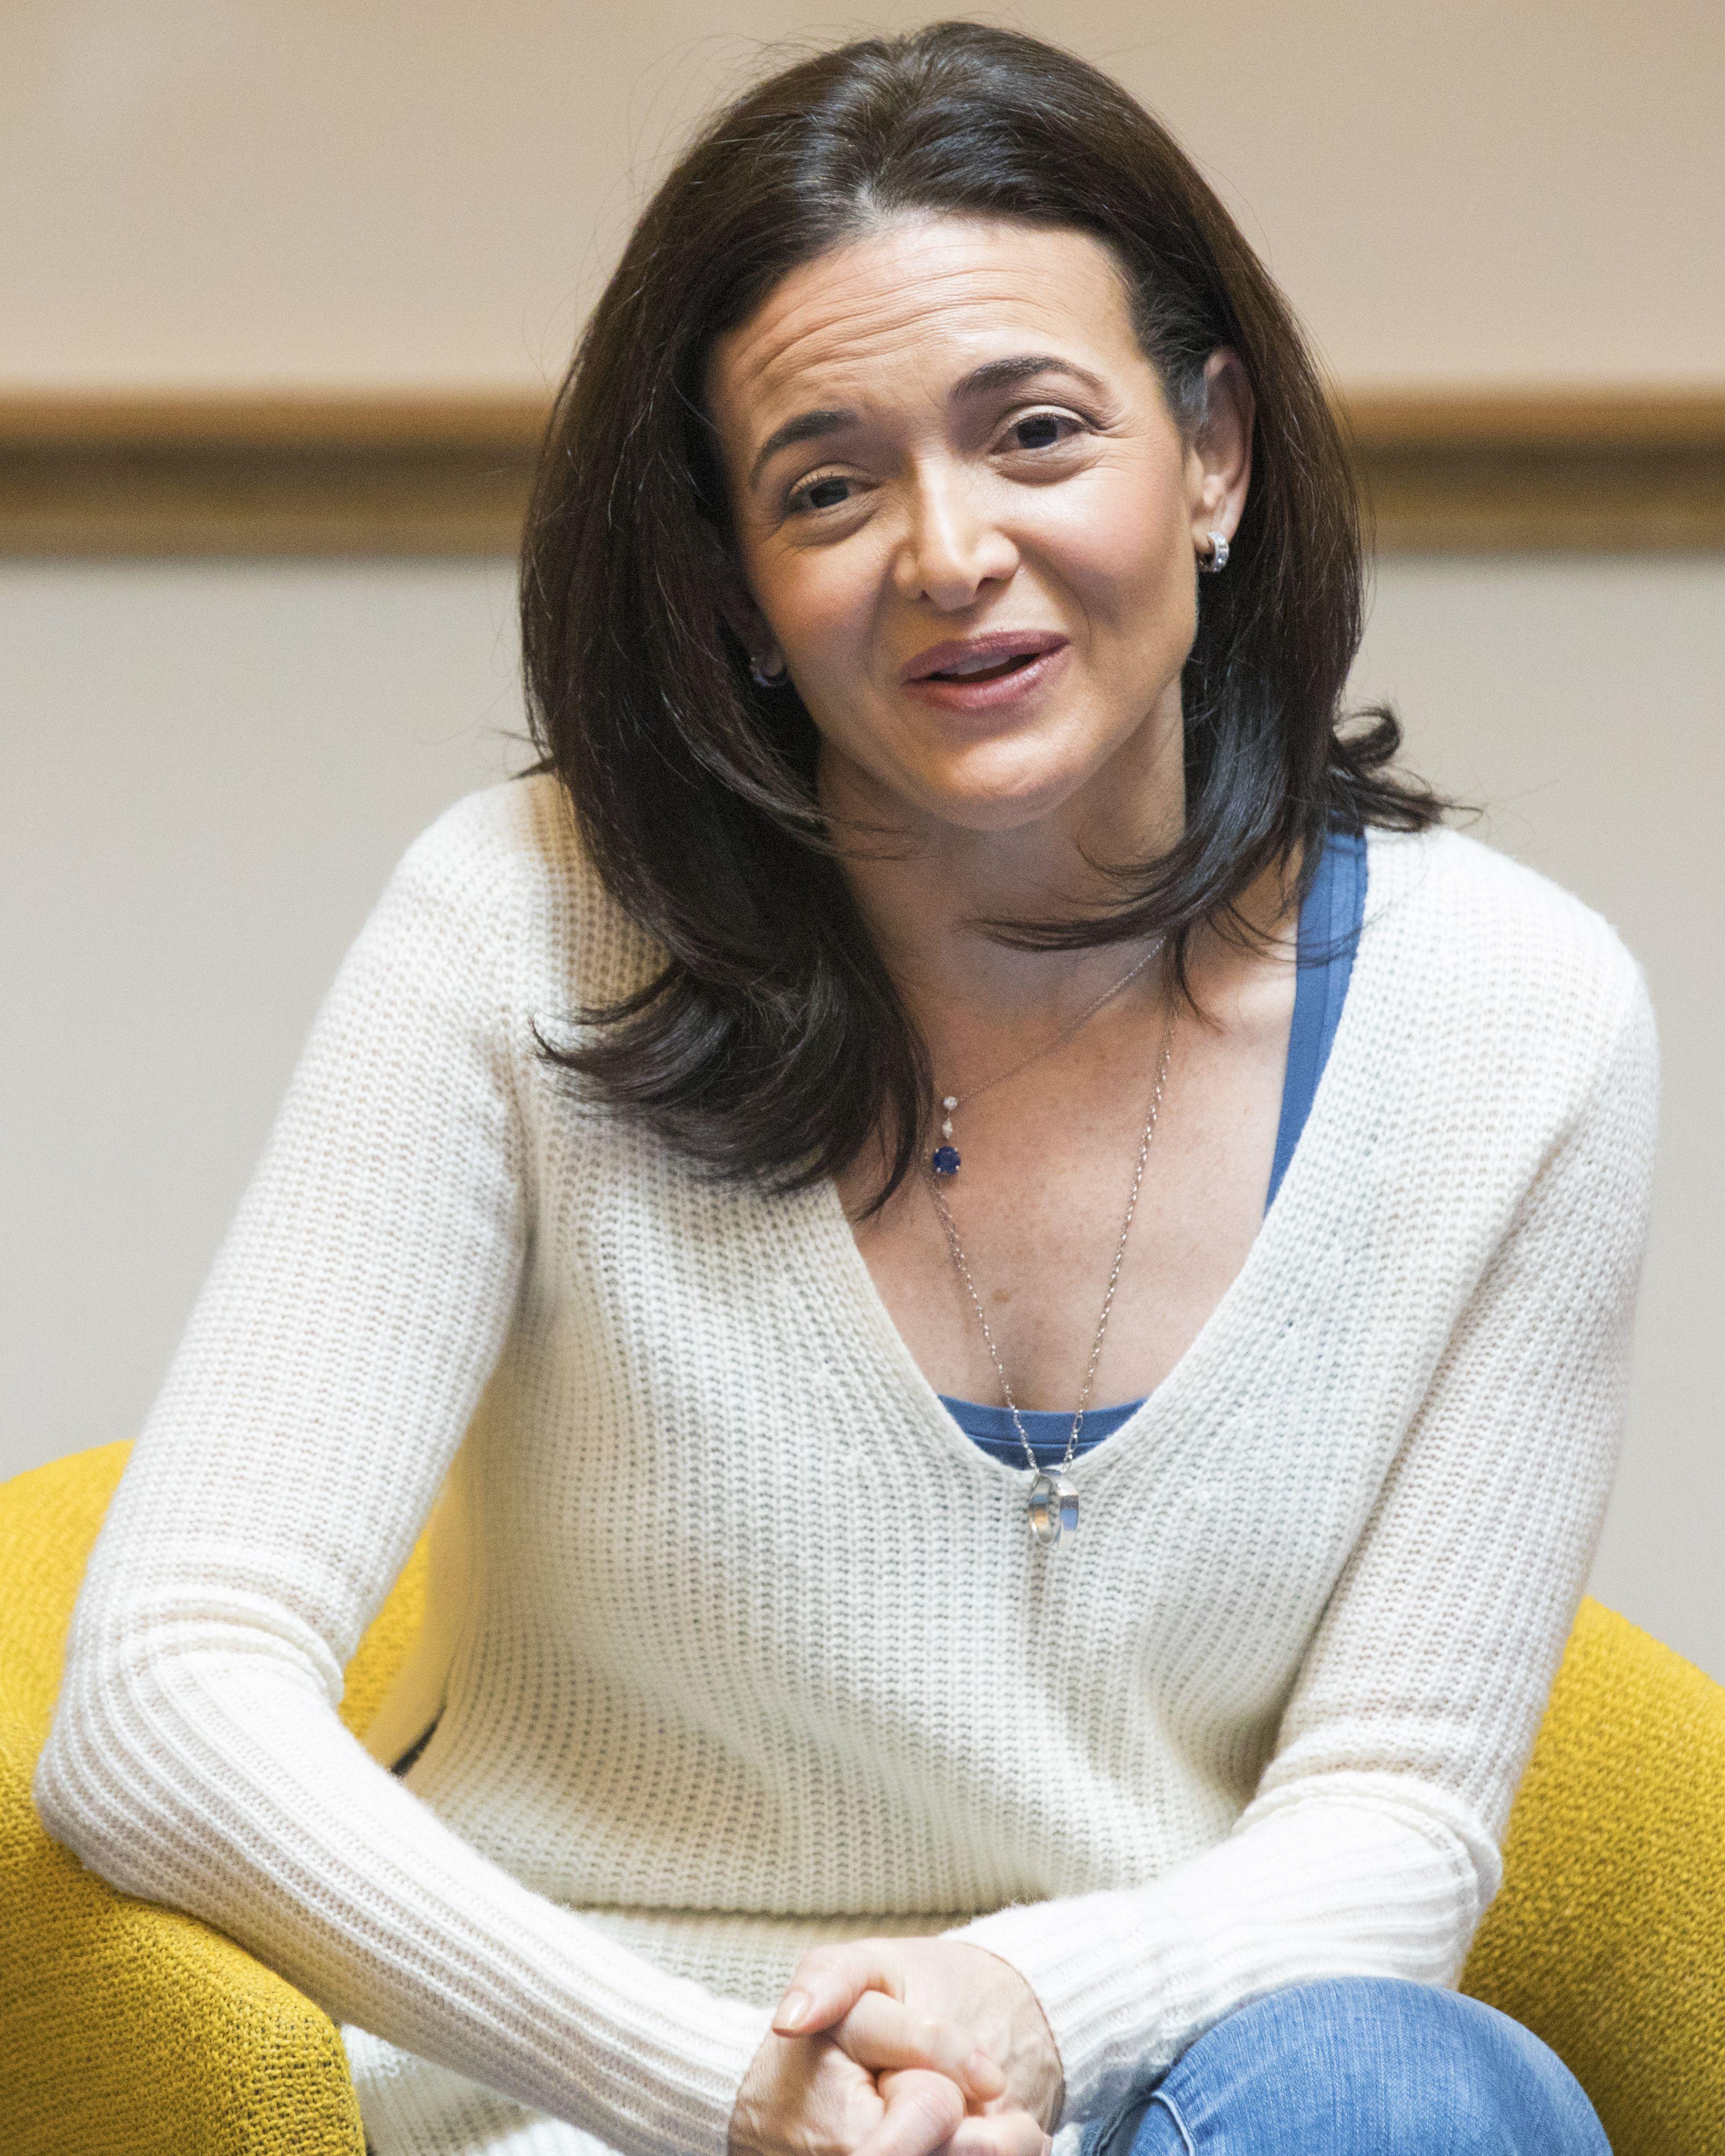 FacebookのCOO、Sheryl Sandberg氏